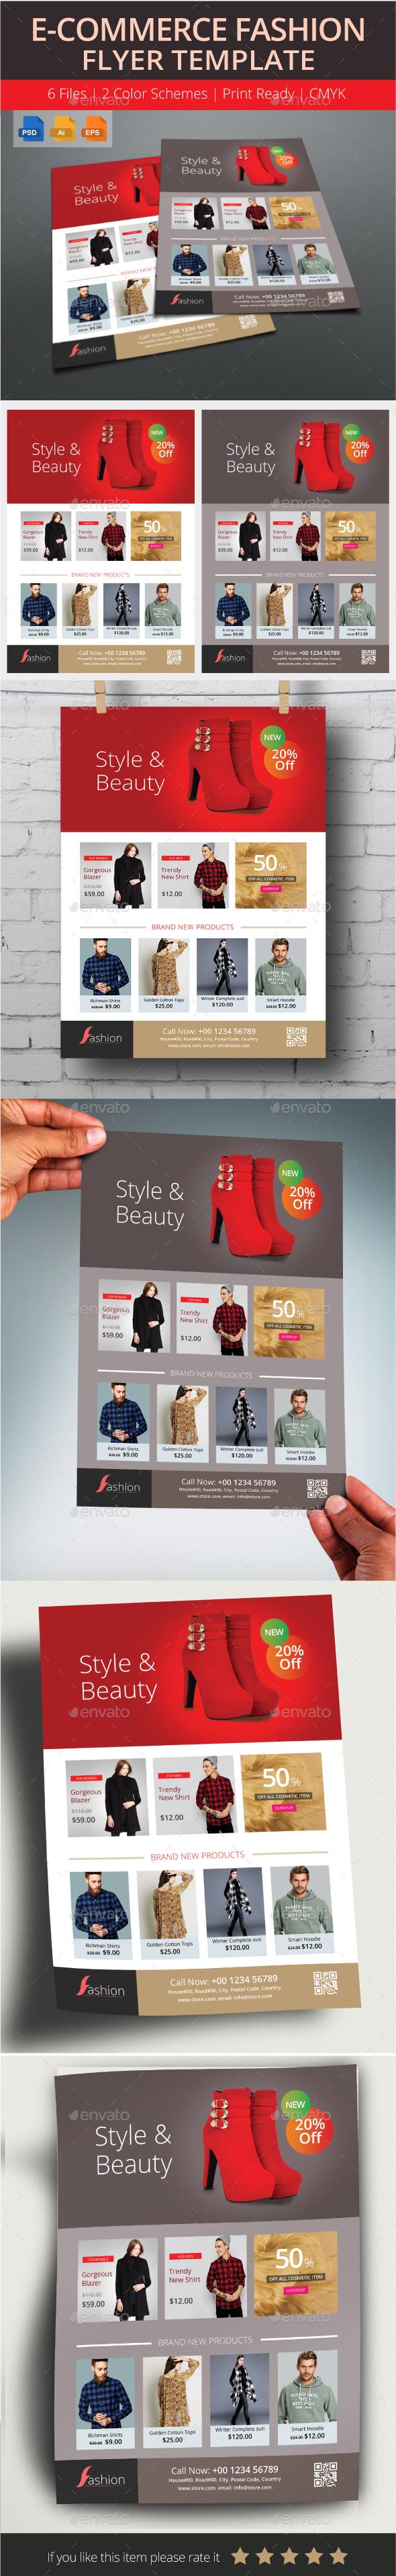 E-Commerce Fashion Flyer Template - Commerce Flyers